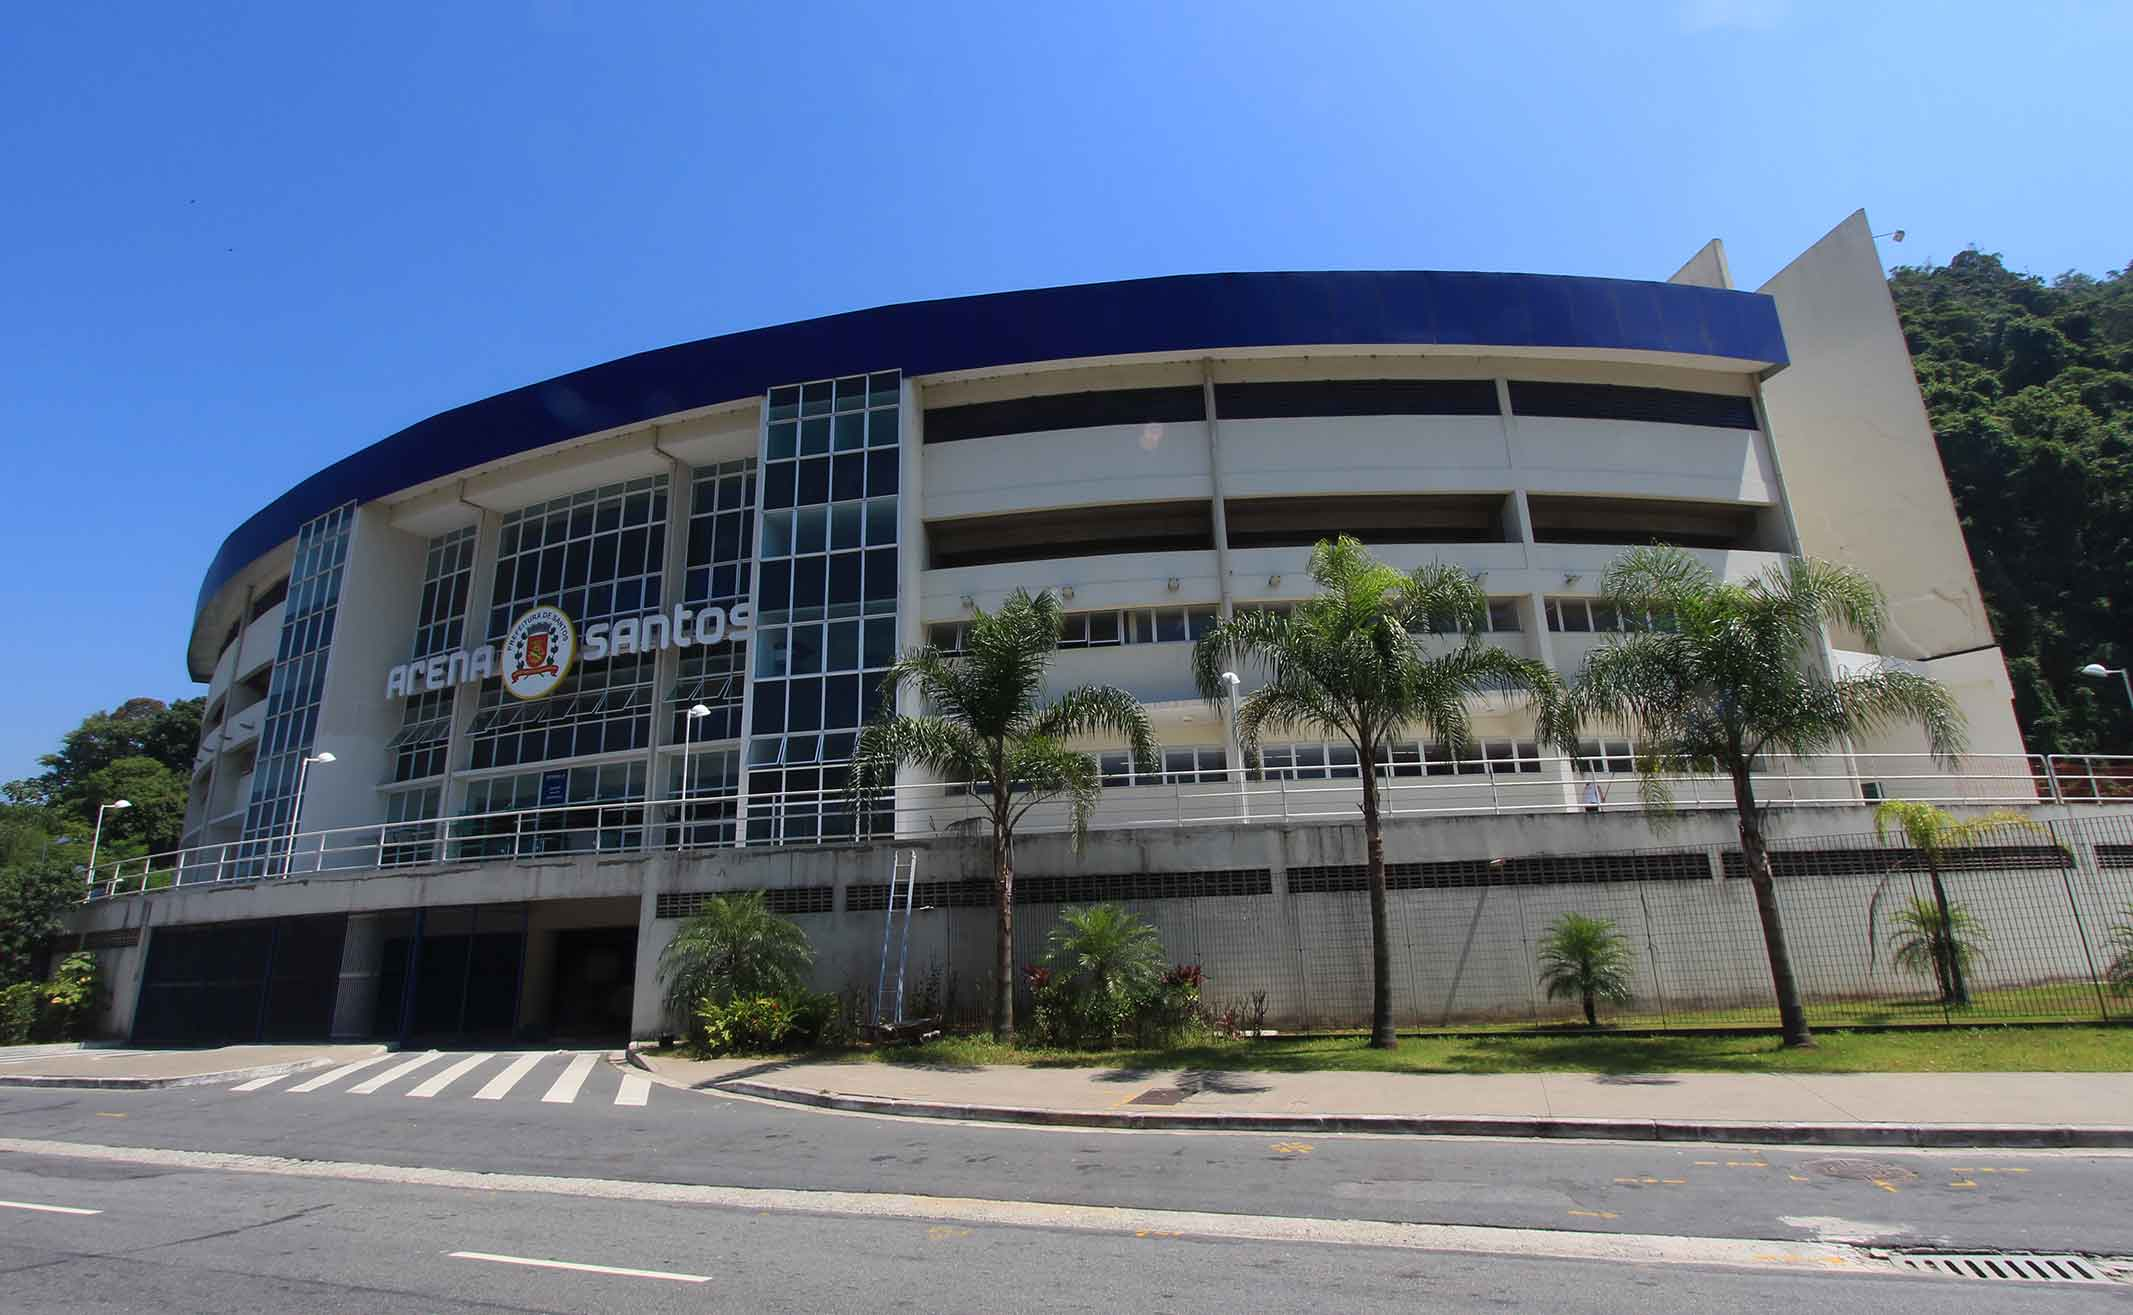 Arena Santos - turismo-esportes-arena-santos-bx